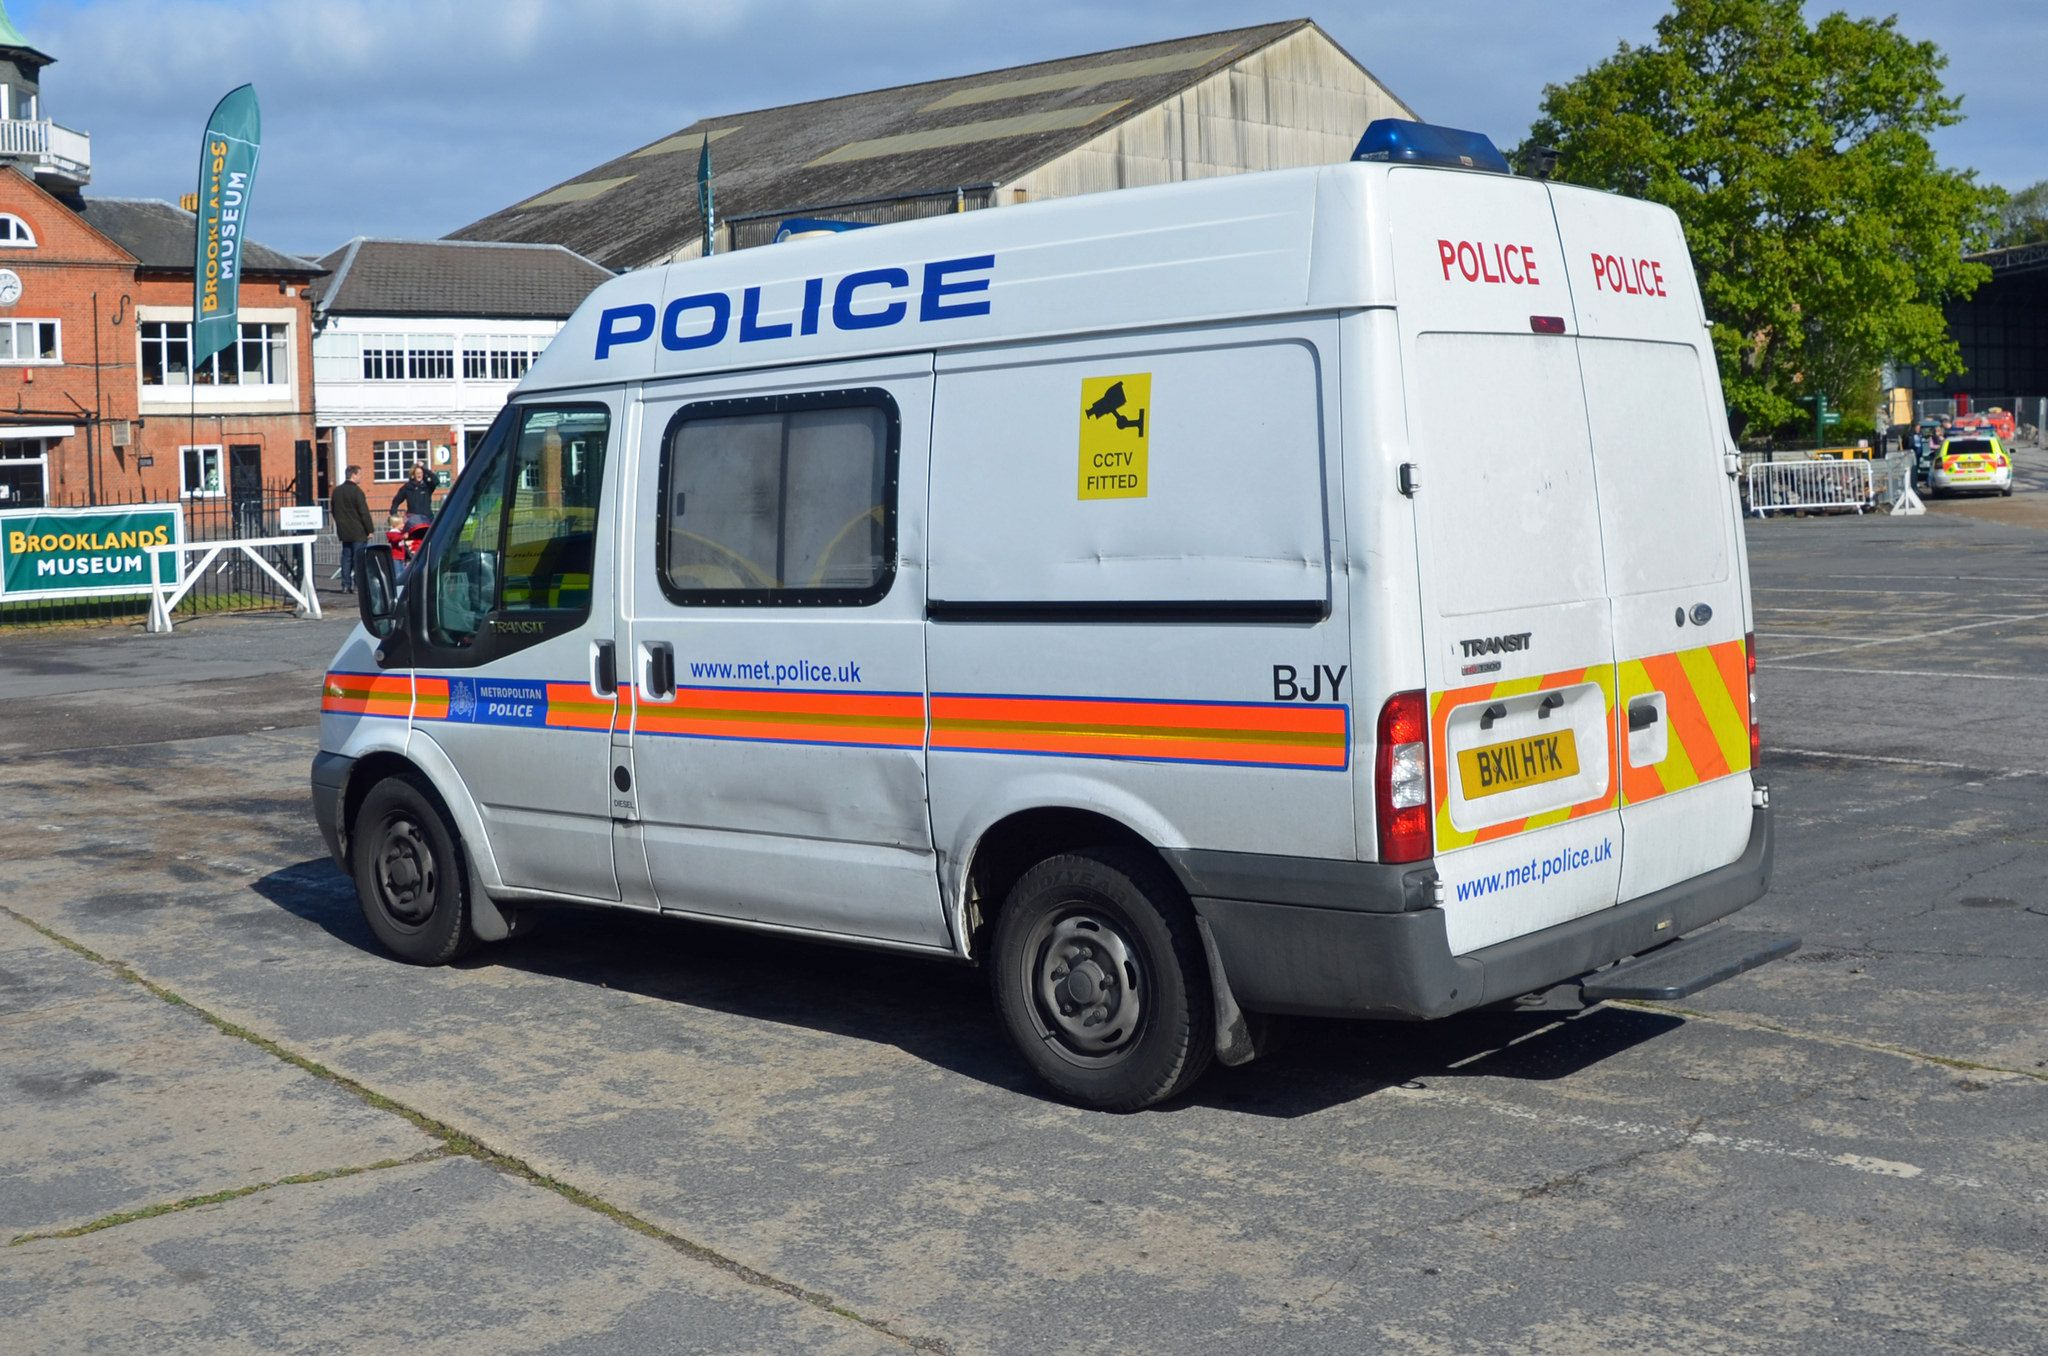 Bx11 Htk Ford Transit Emergency Vehicles Police